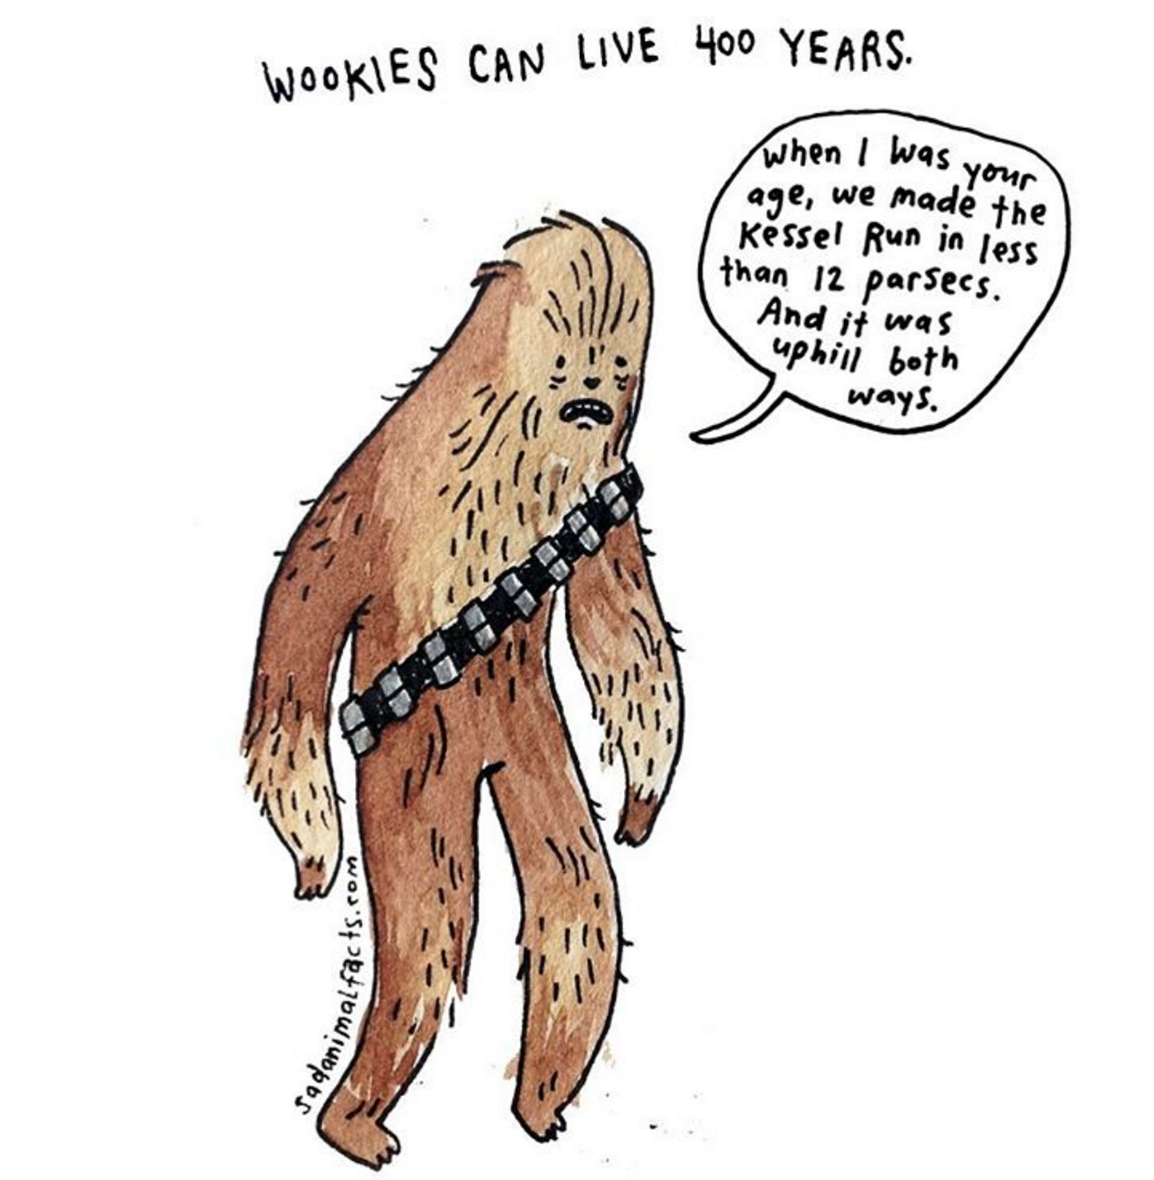 sad animal facts wookie